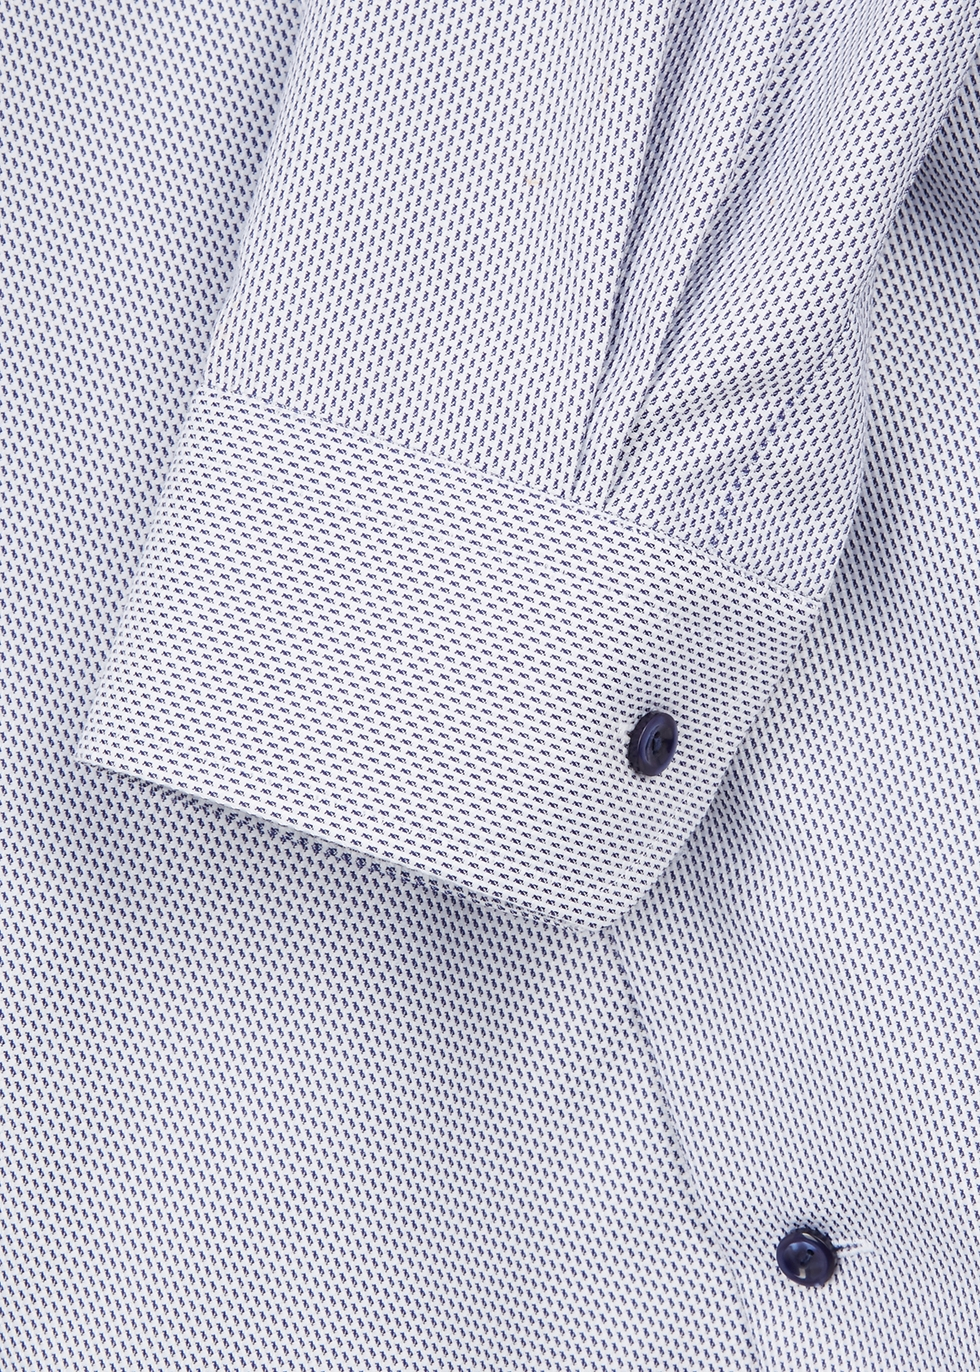 Blue and white contemporary cotton shirt - Eton